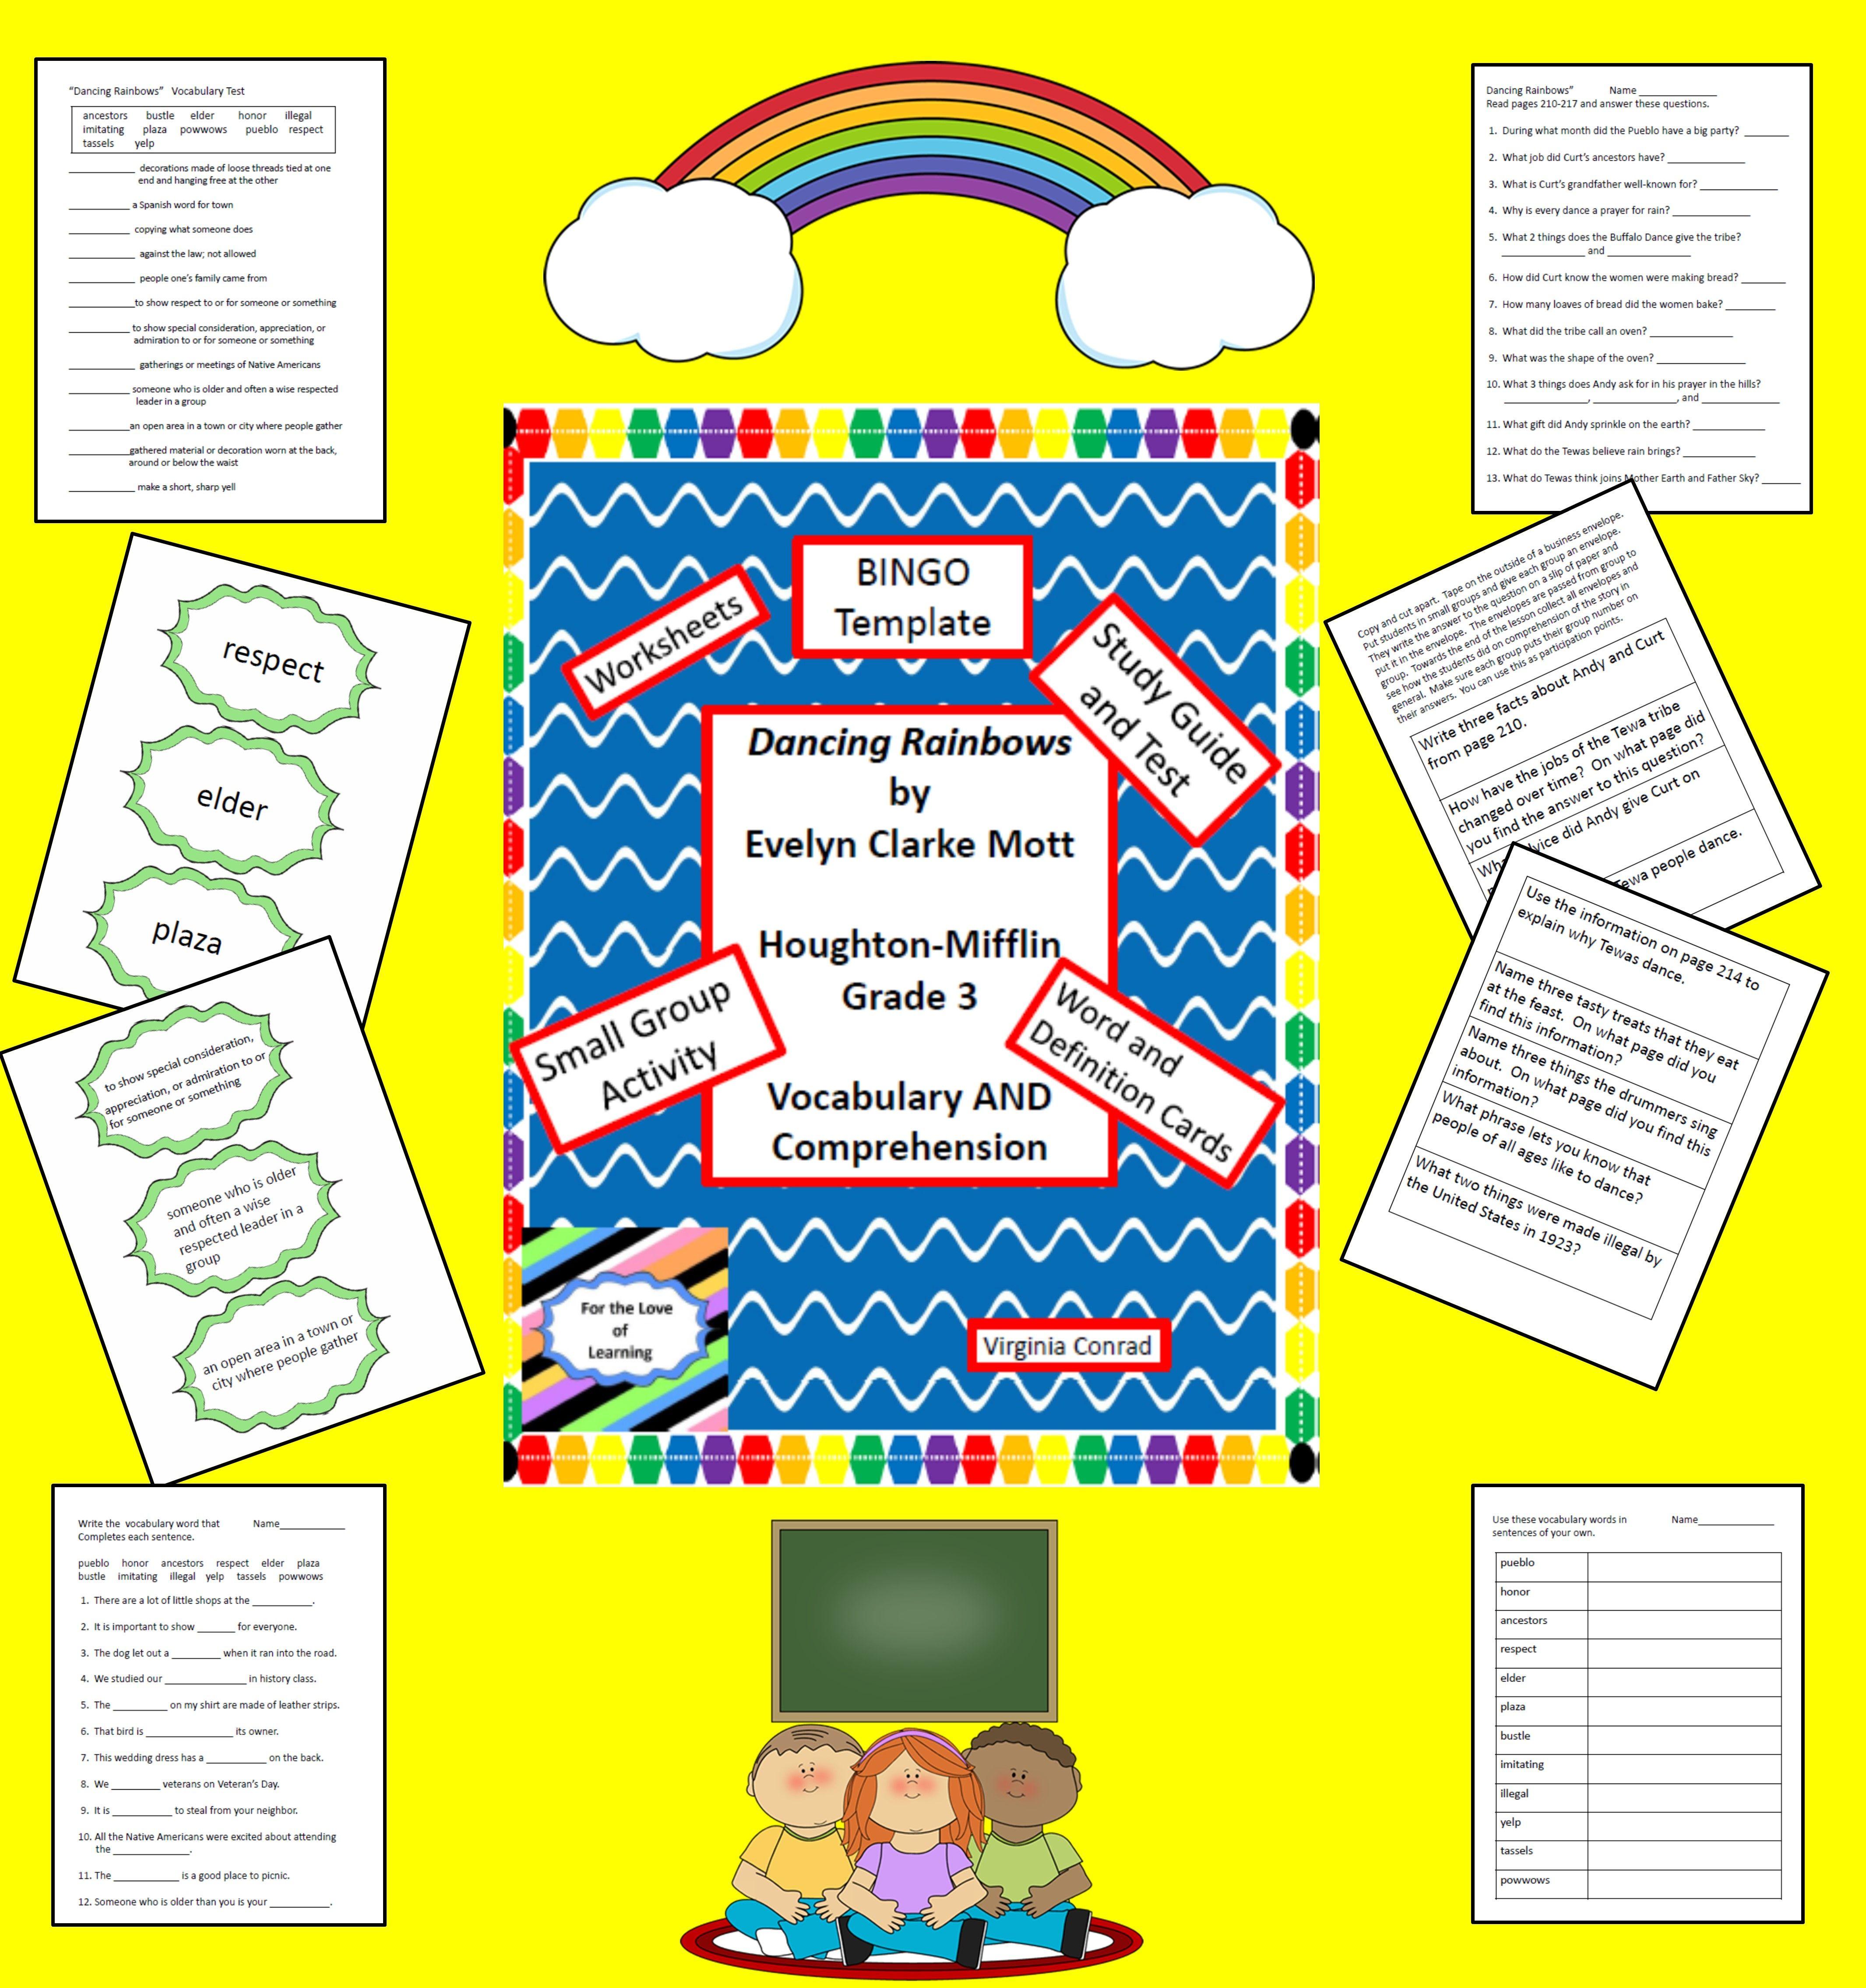 Dancing Rainbows By E C Mott Houghton Mifflin Grade 3